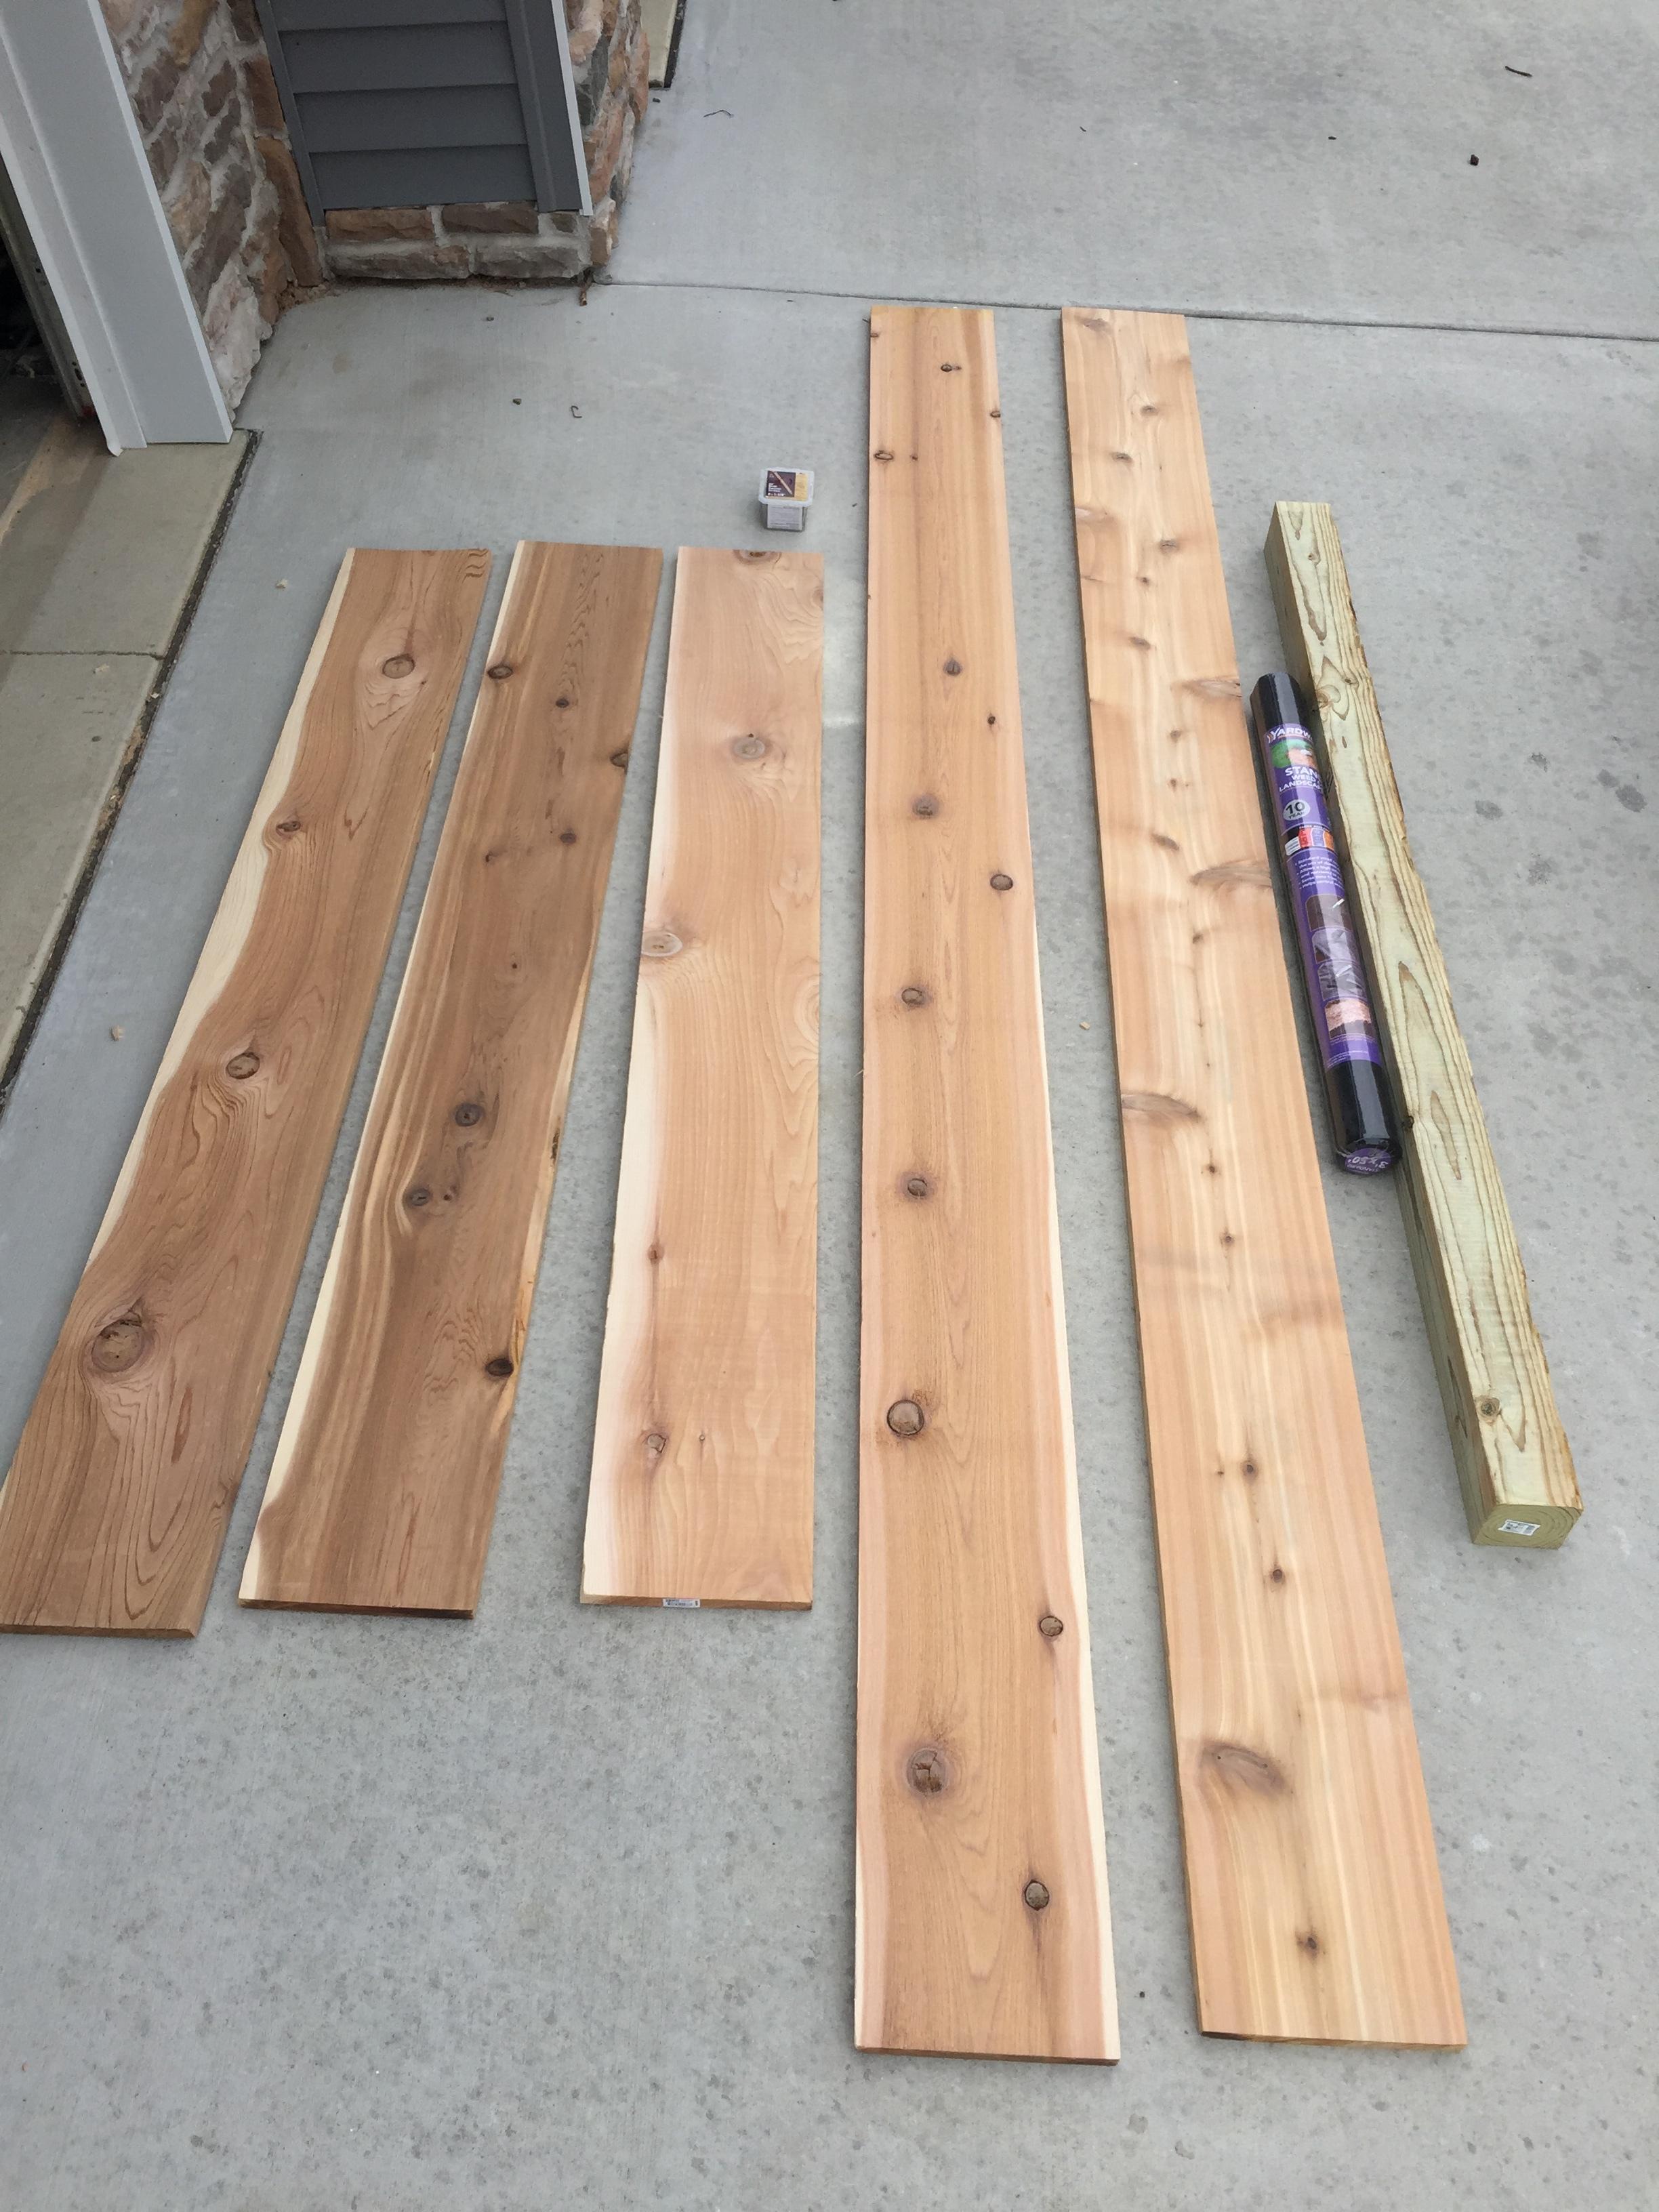 Cedar boards, screws, weed fabric